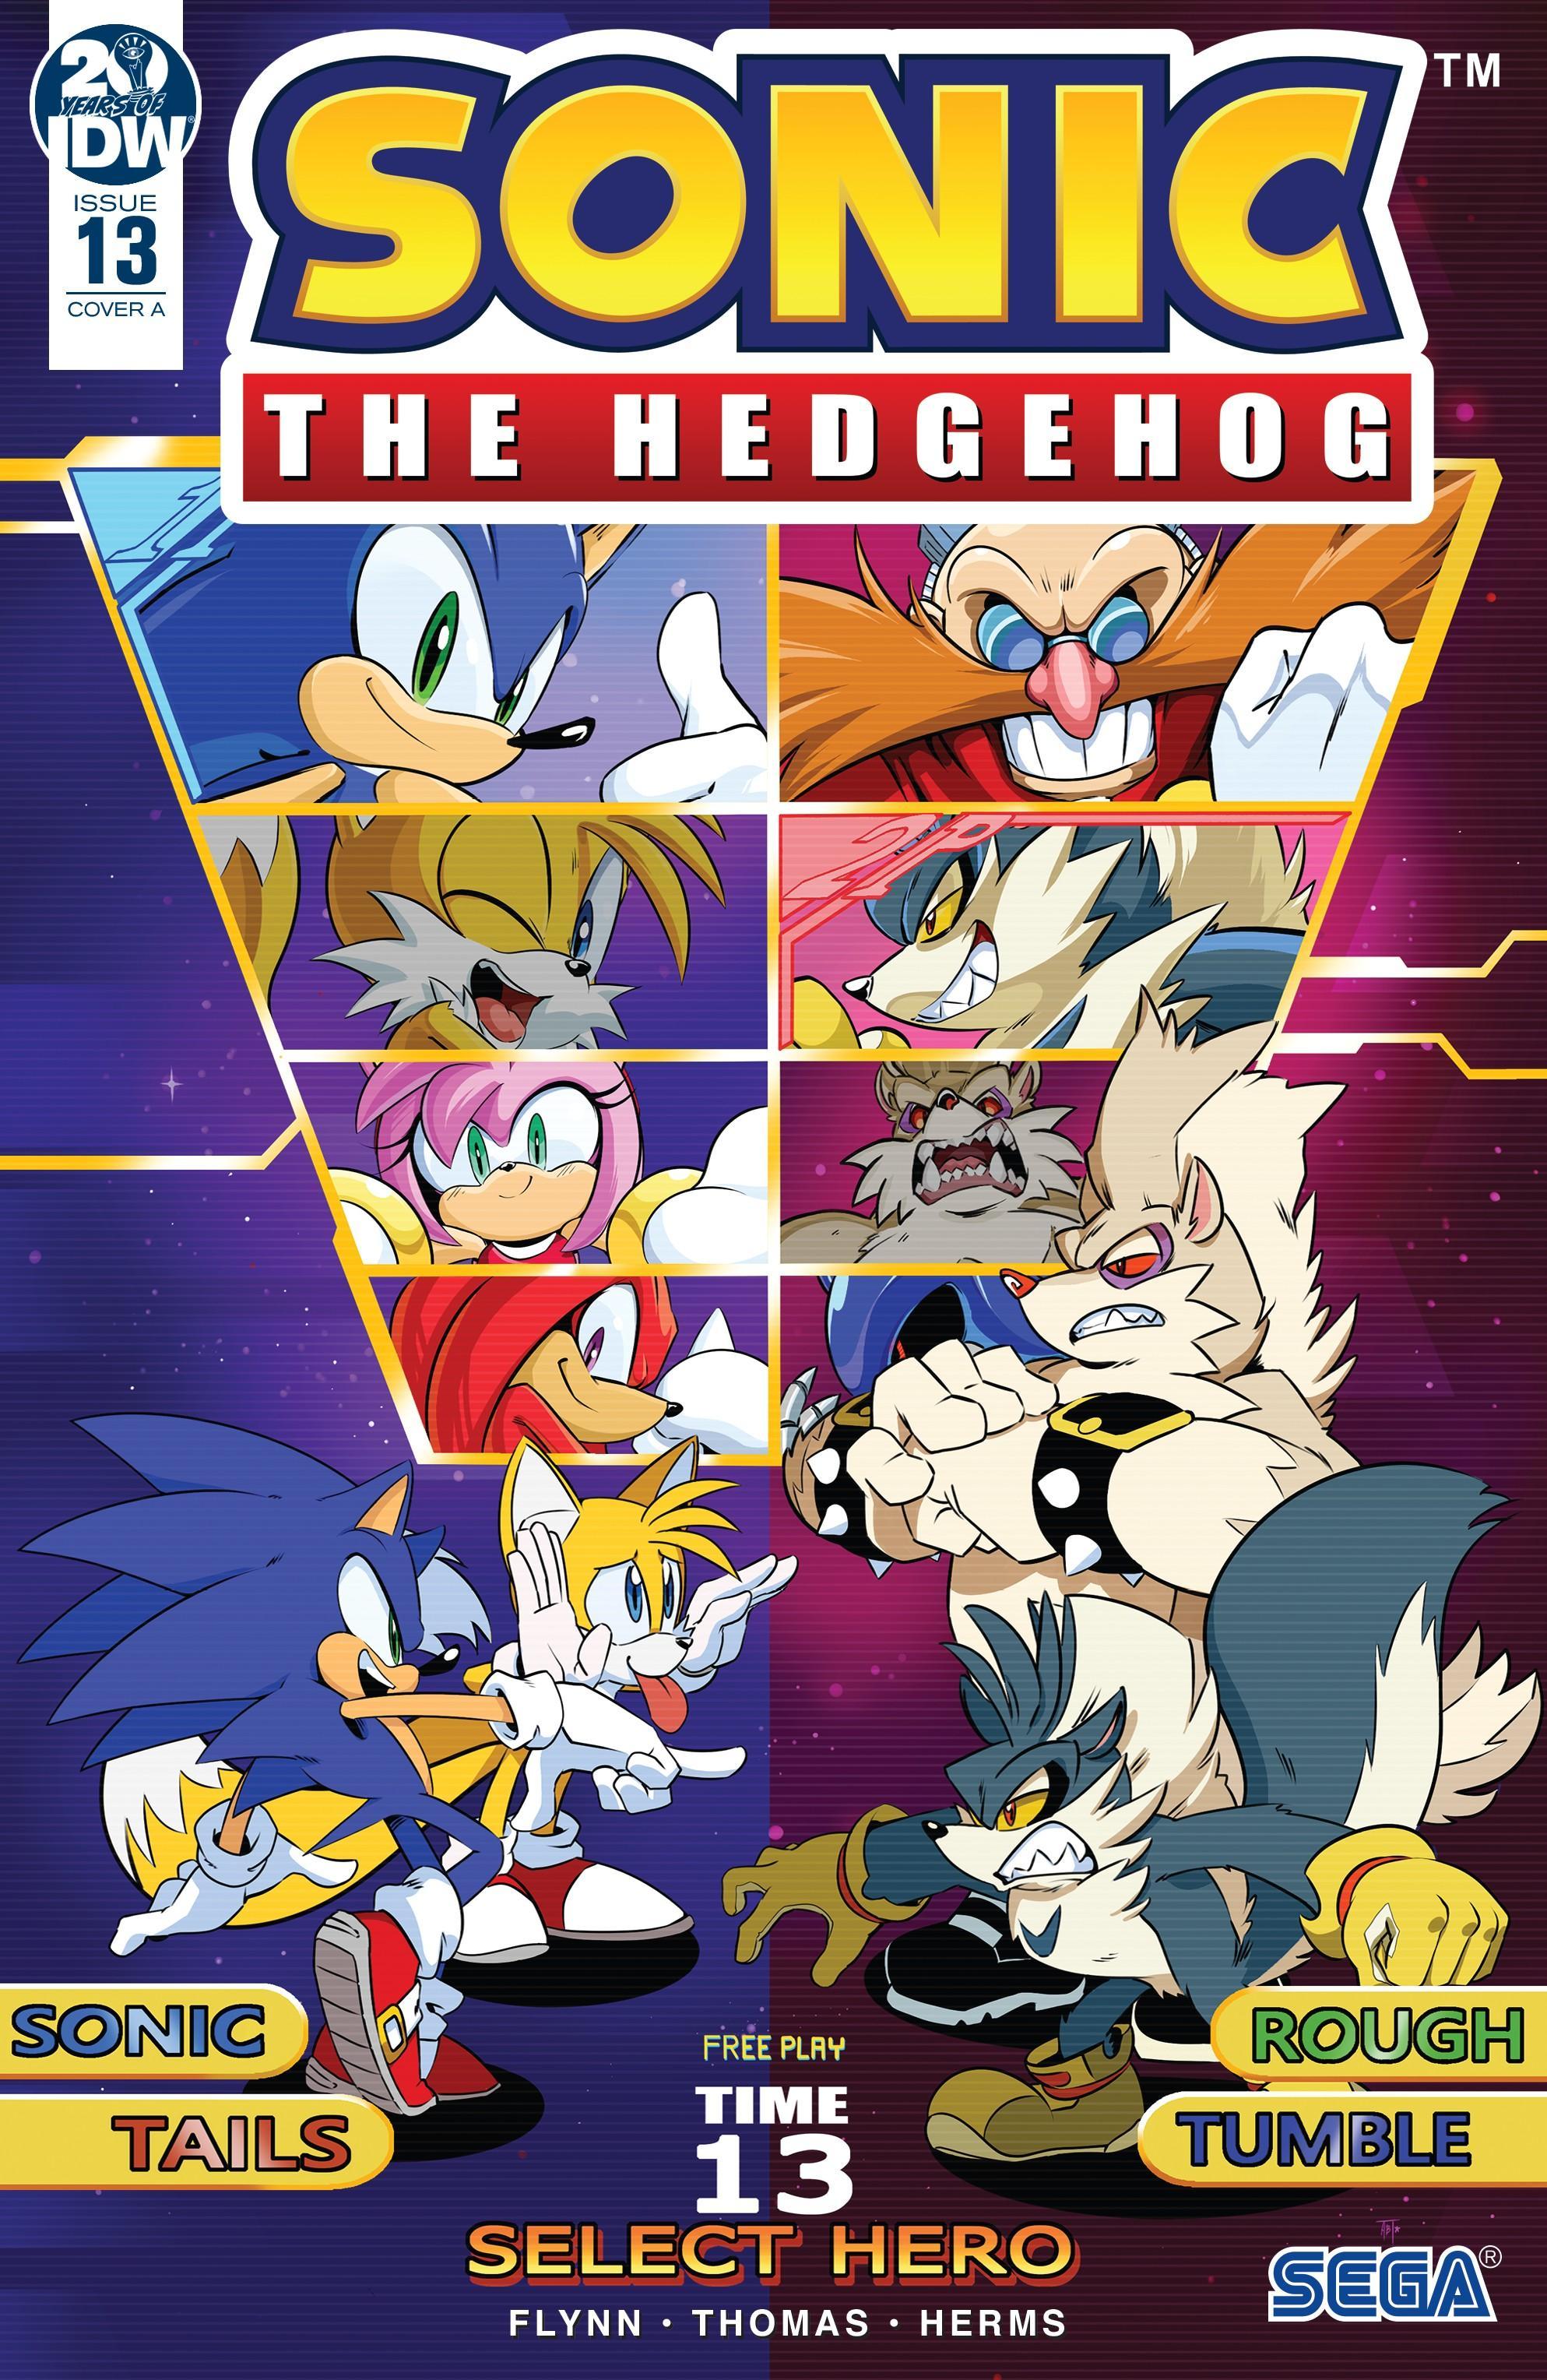 Sonic The Hedgehog 013 2019 Oroboros